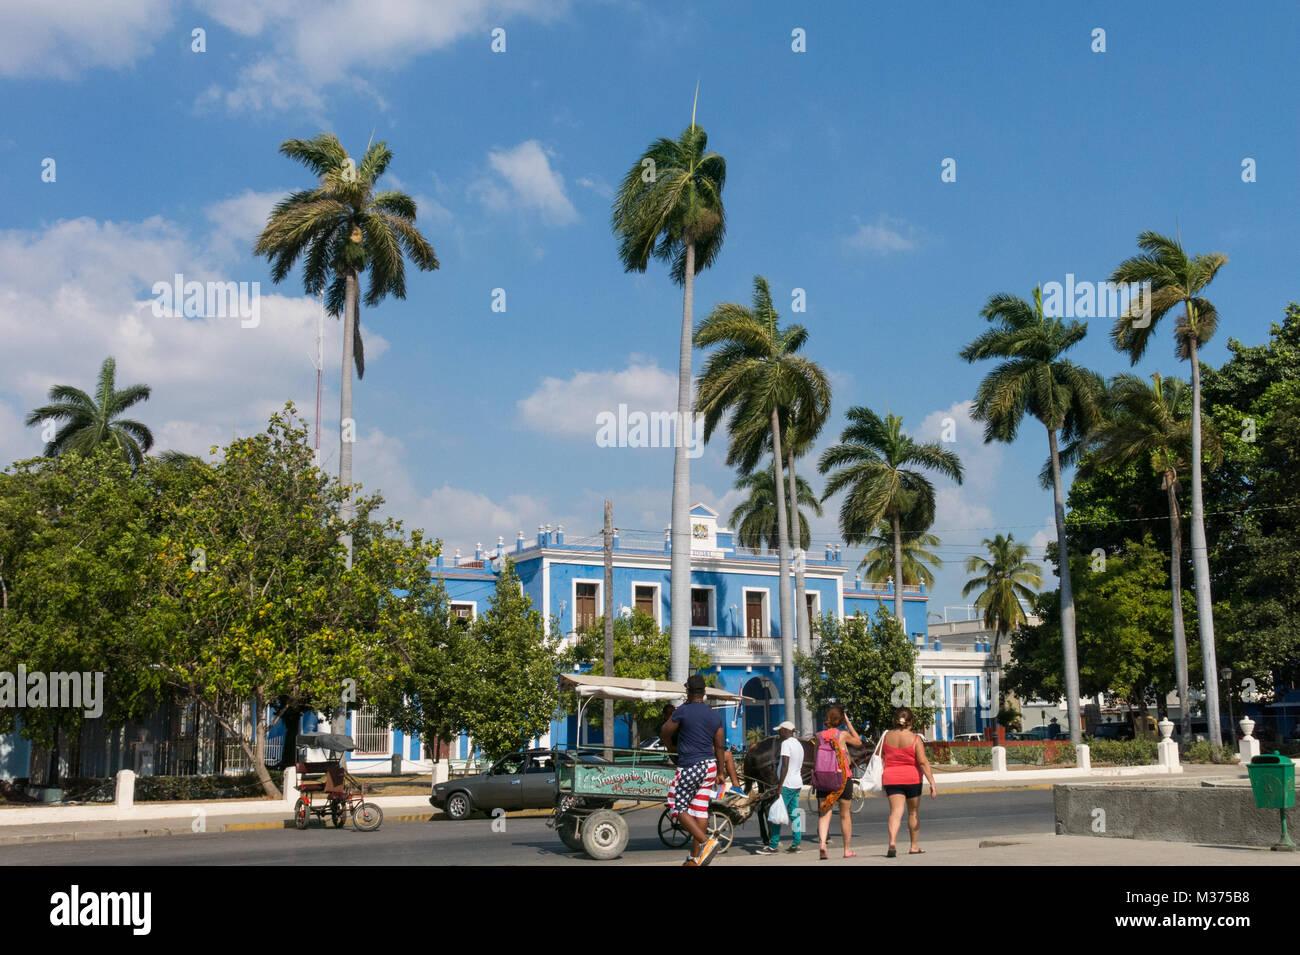 CIENFUEGOS, CUBA - JANUARY 3, 2017: Jose Marti Park, the main square of Cienfuegos, in front of the Purisima Concepcion - Stock Image